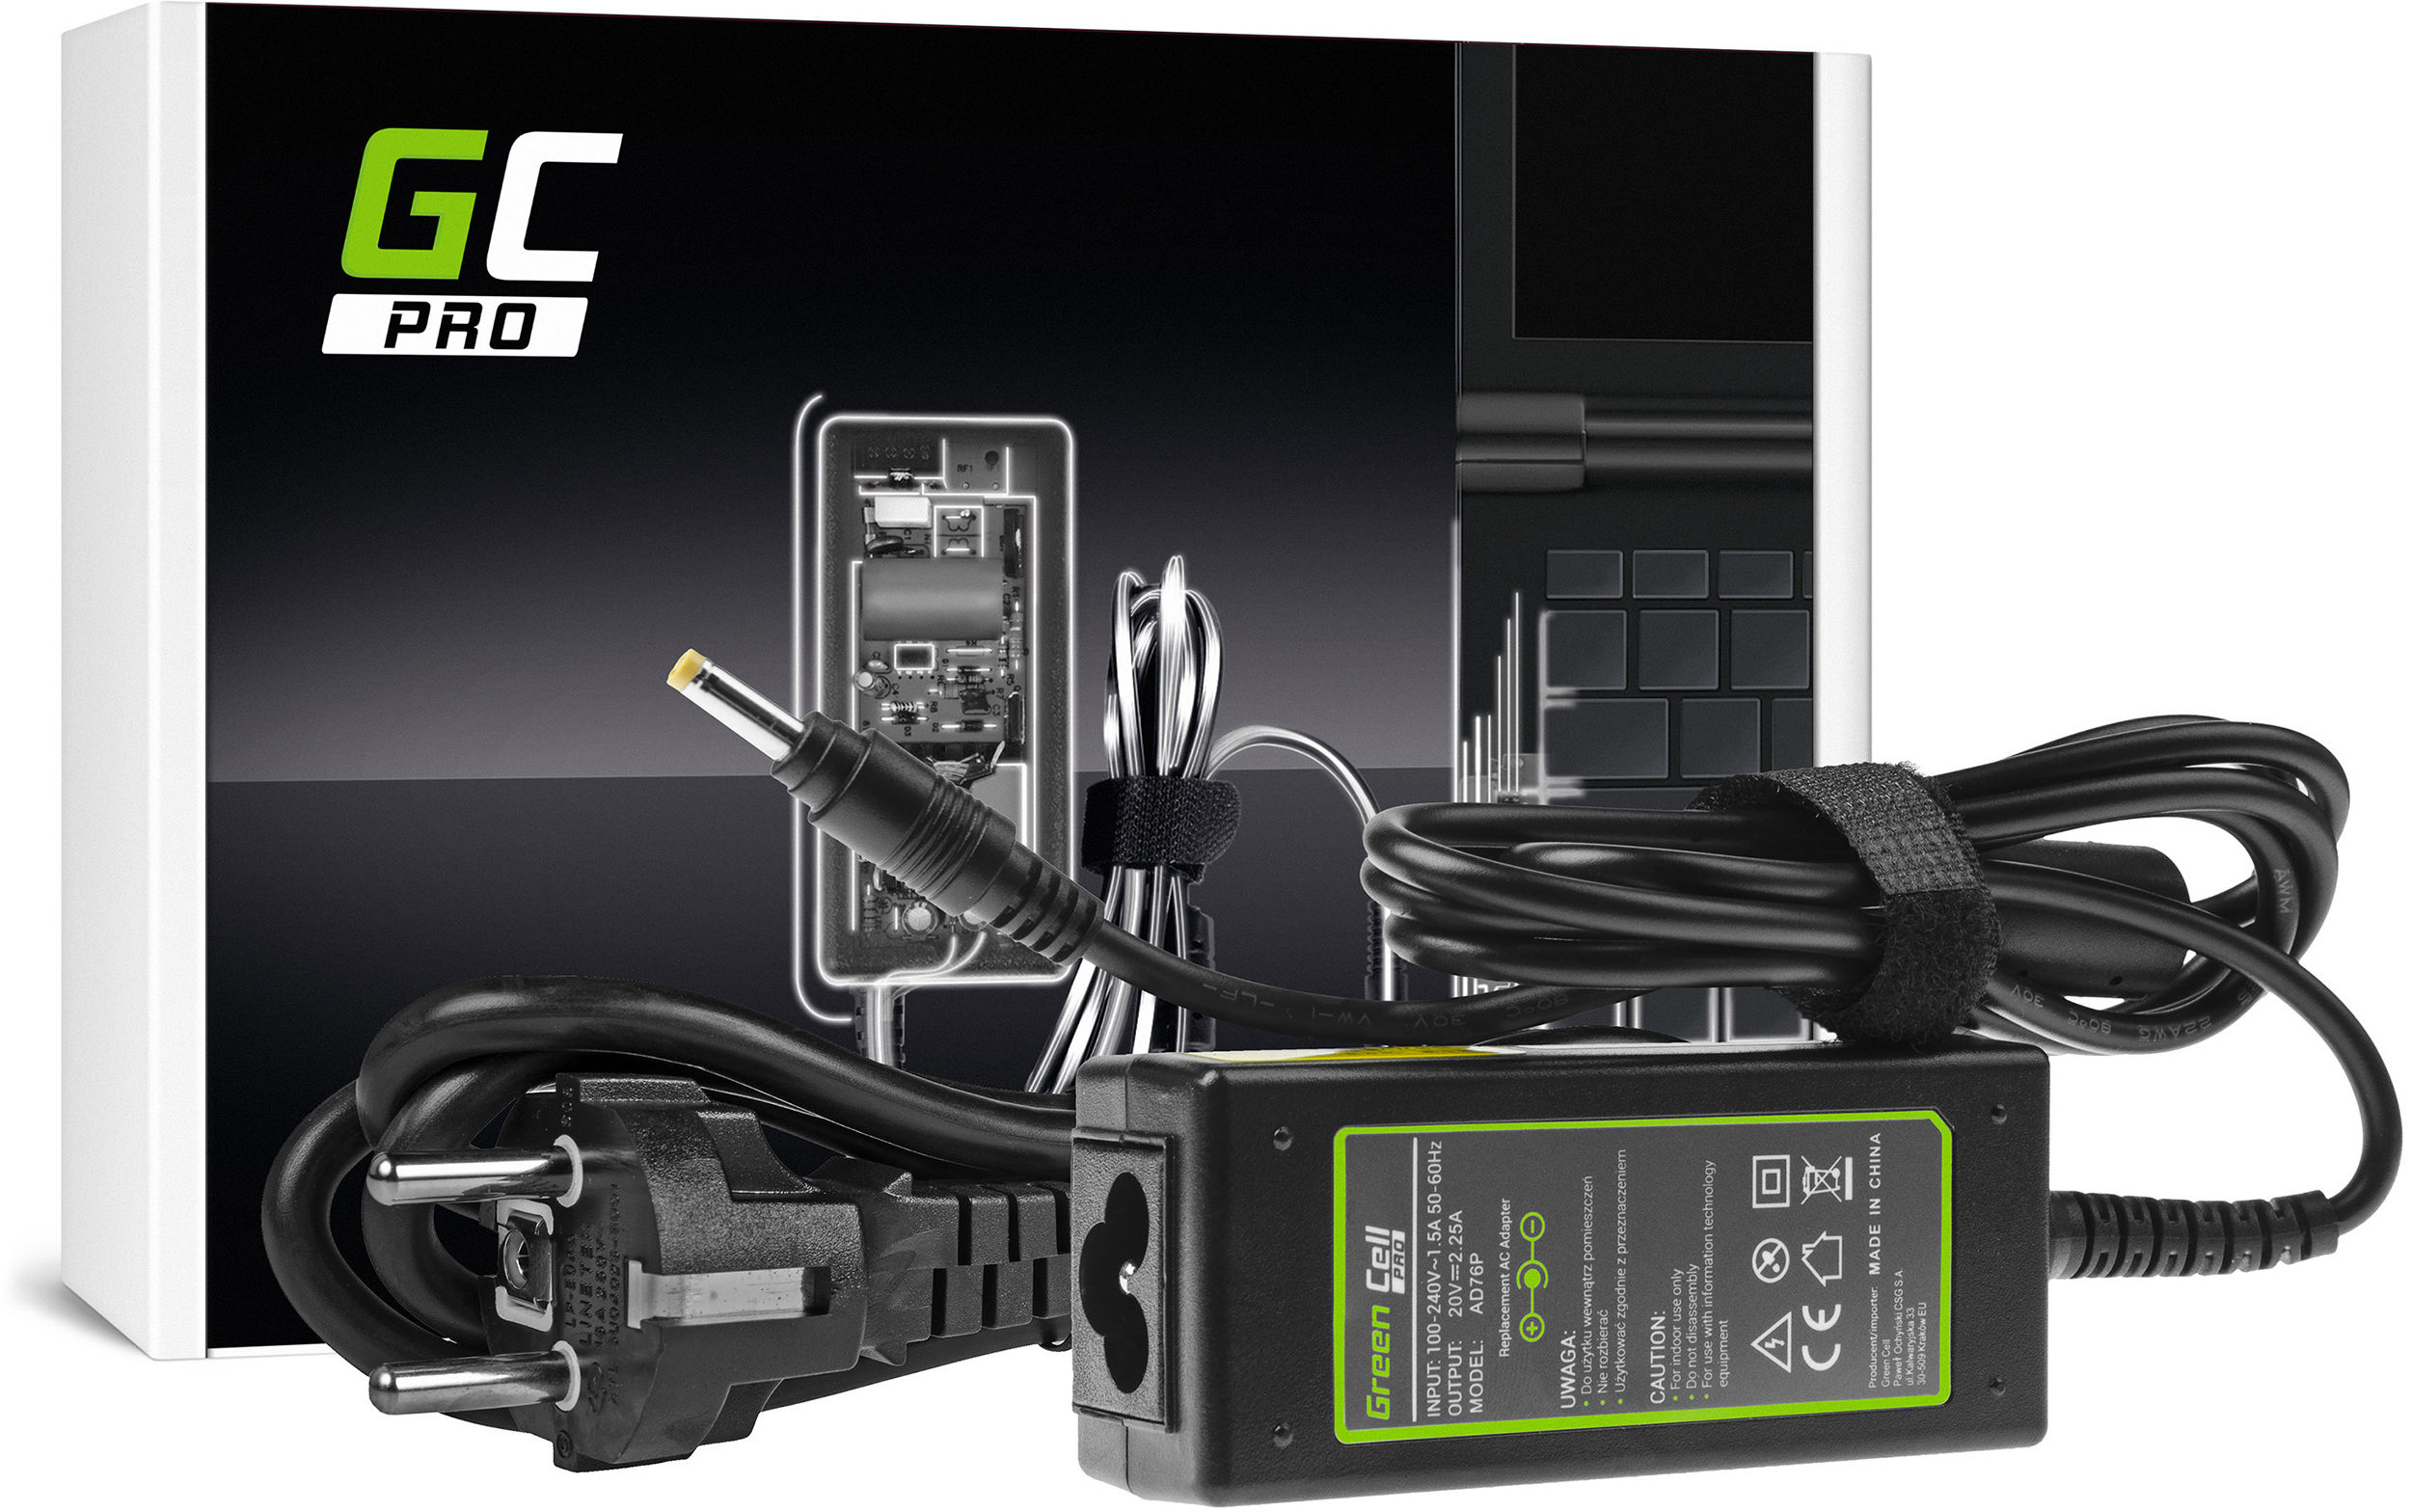 Zasilacz Ładowarka Green Cell PRO 20V 2.25A 45W do Lenovo IdeaPad 100 100-15IBD 100-15IBY 100s-14IBR 110 110-15IBR Yoga 510 520